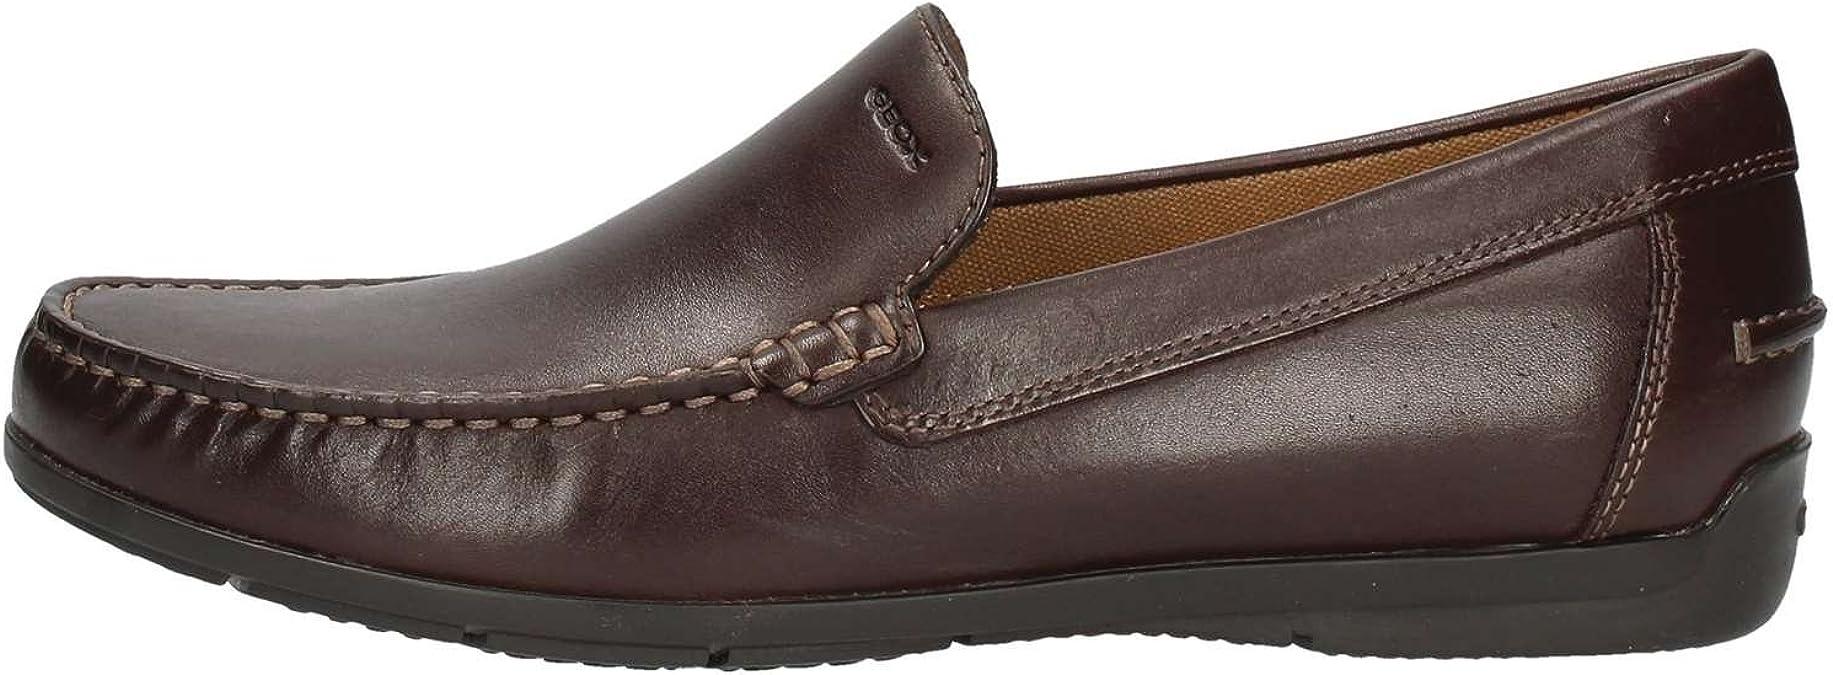 Homme Loafers Mocassins Geox U Leitan C